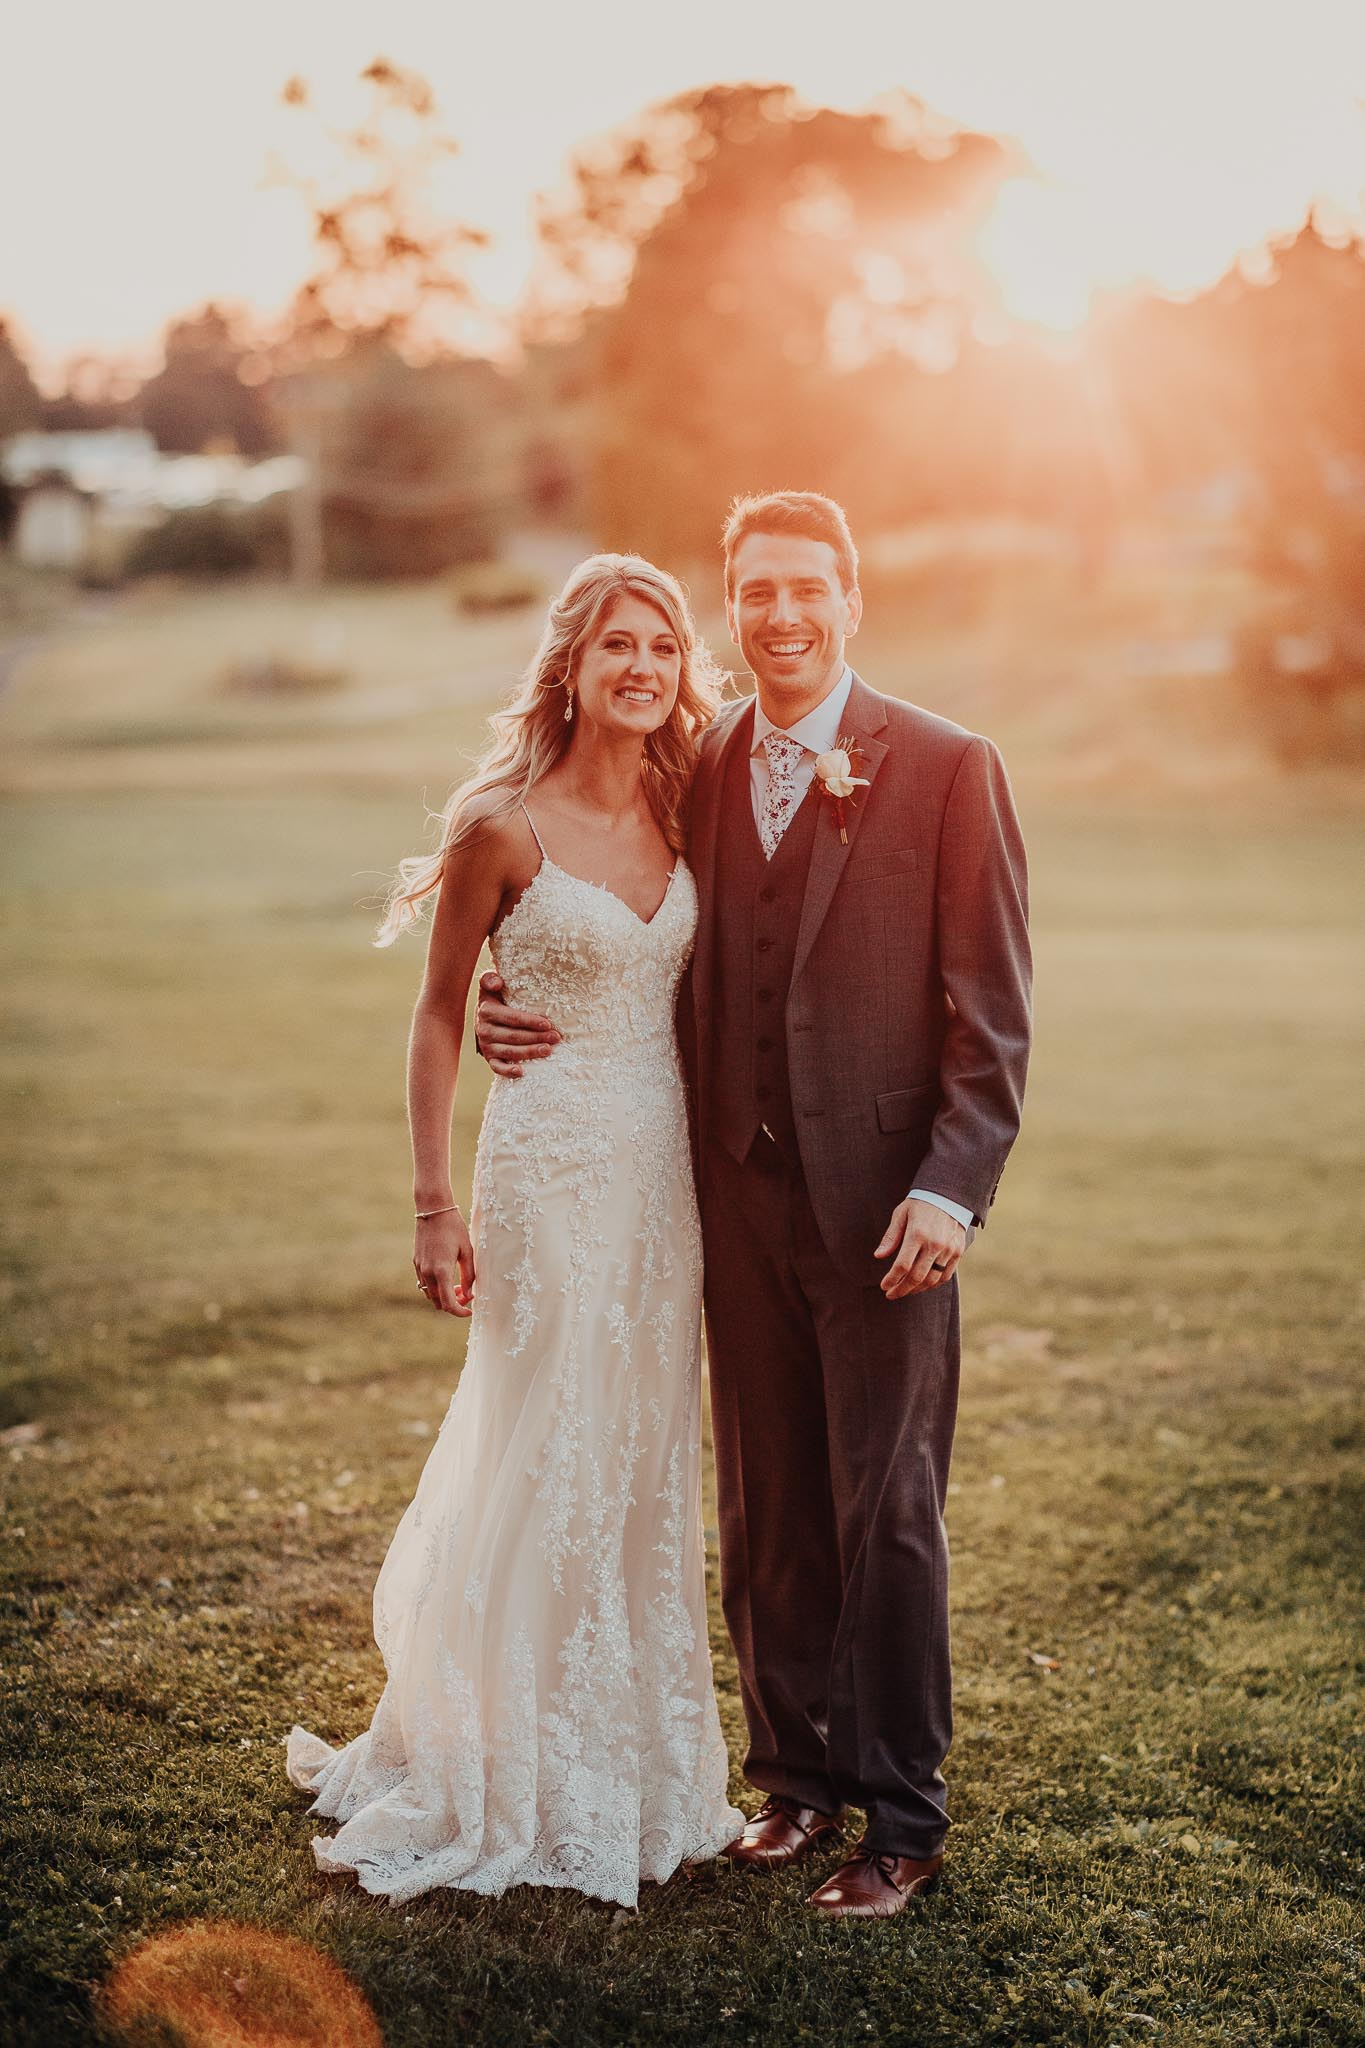 Frosty-Valley-September-Wedding-8417.jpg